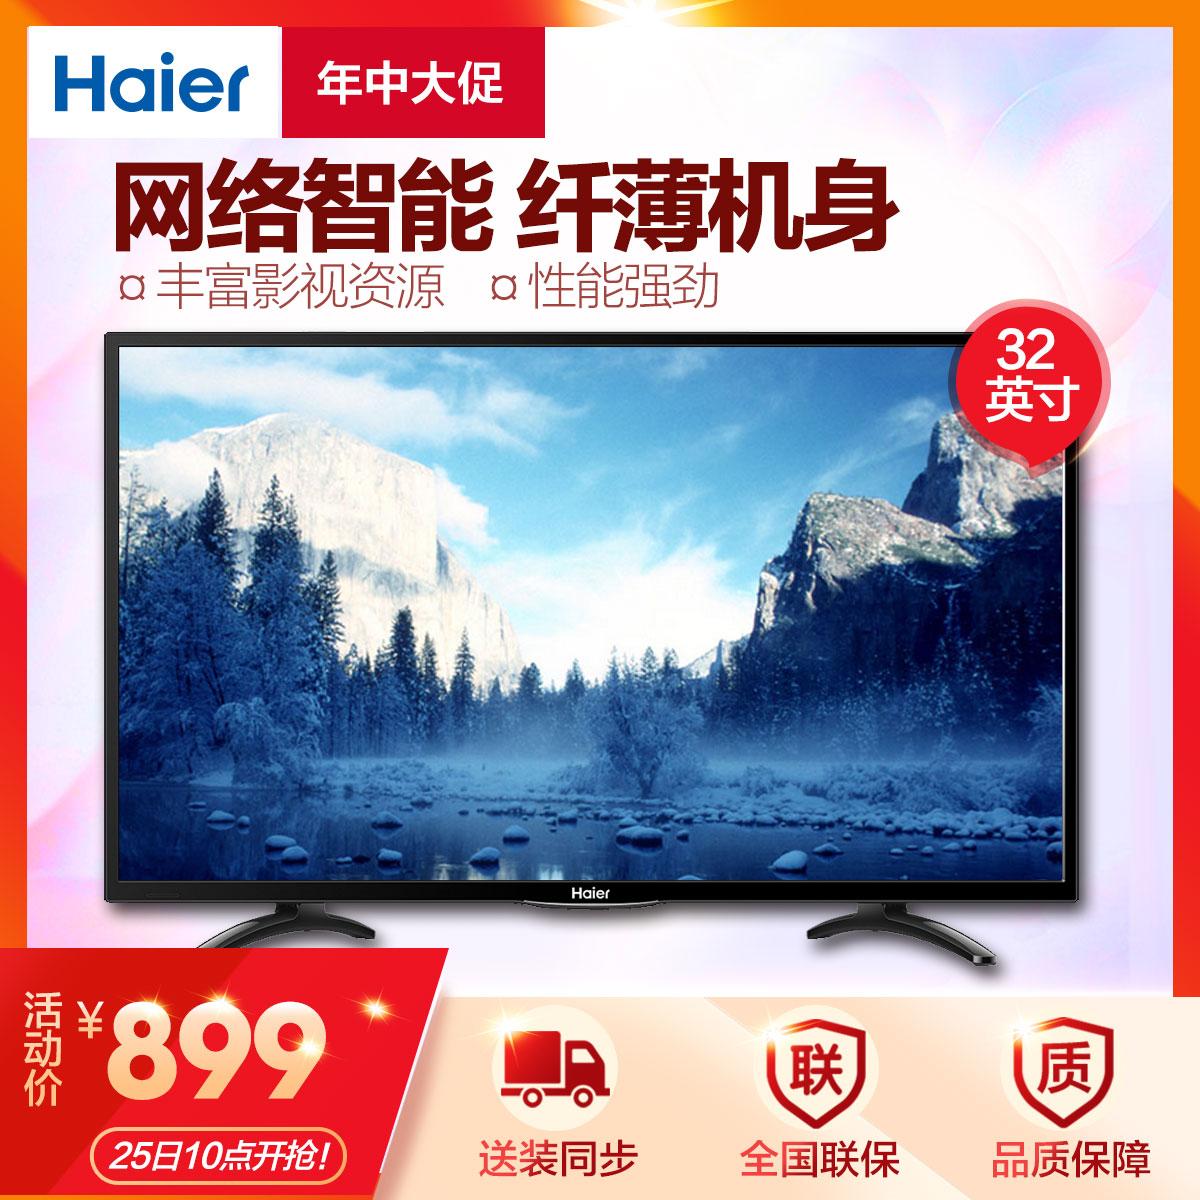 LE32A31  32英寸高清鸿运国际hv522网络电视机